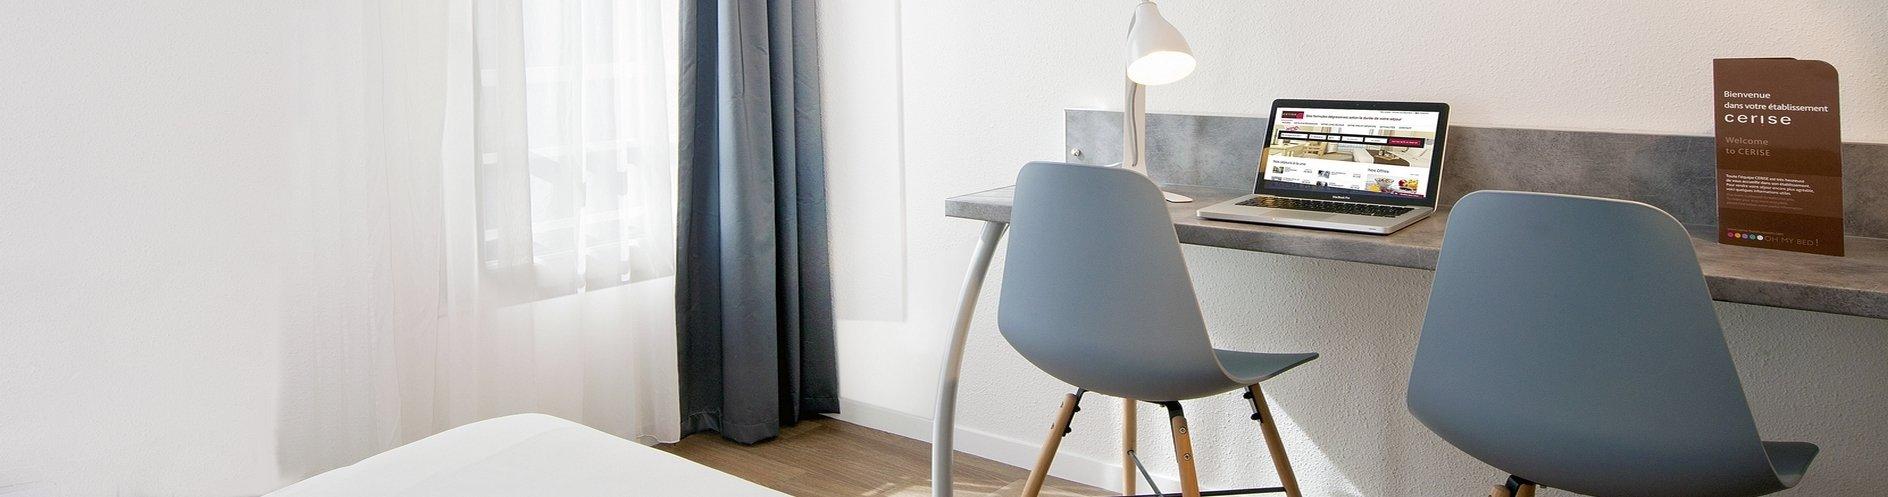 cerise-residence-lannion-studio-double-confort.jpg